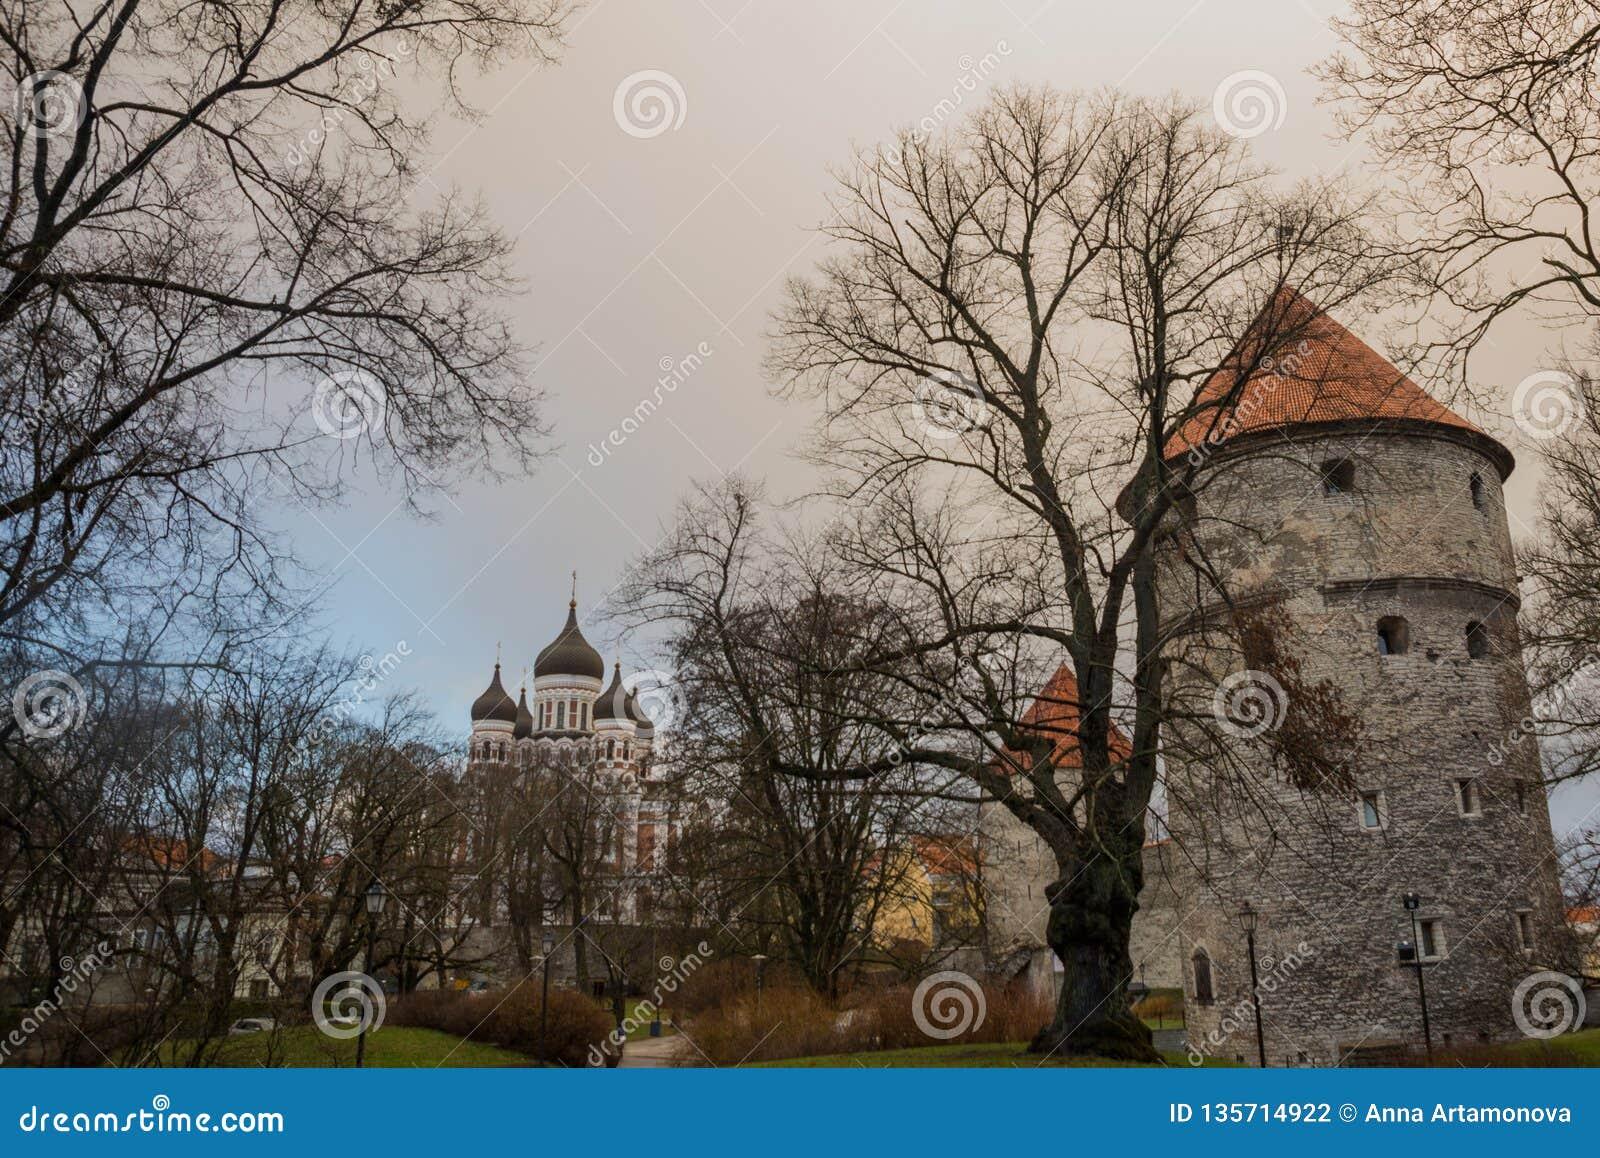 Tallinn, Estonia: Kiek in de Kok Museum and Bastion Tunnels in medieval Tallinn defensive city wall. View Of Alexander Nevsky